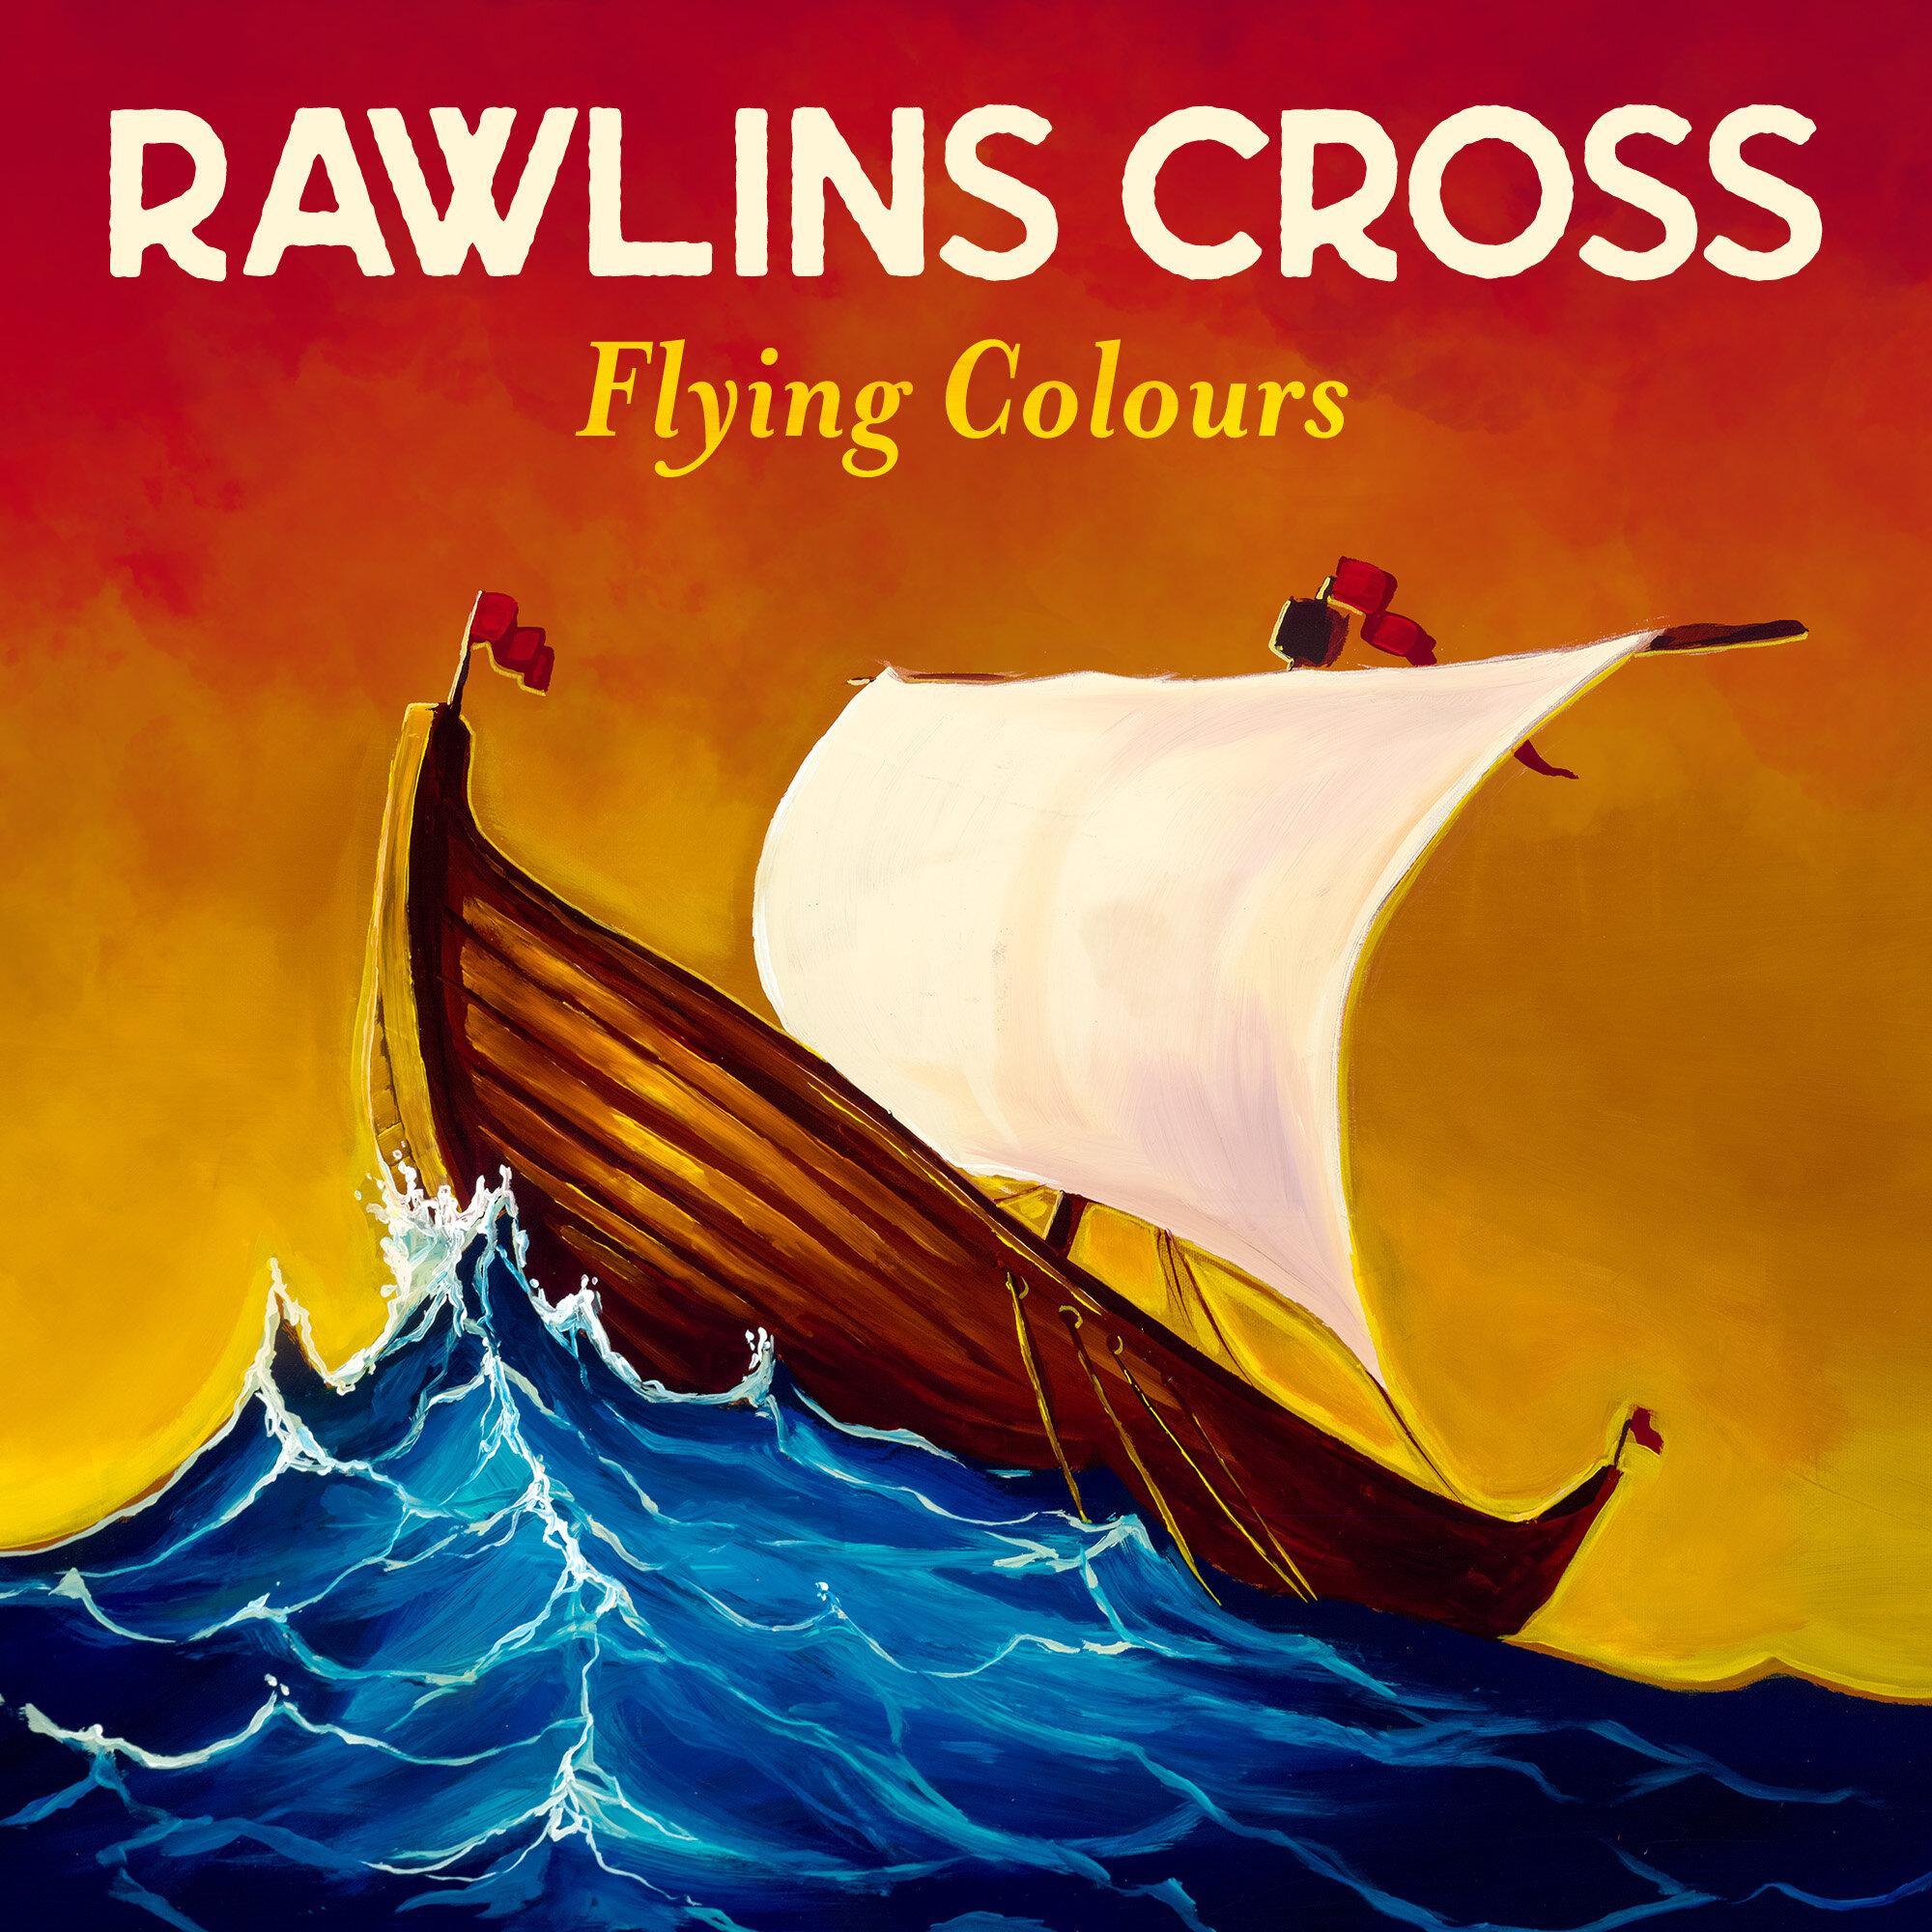 RC_FlyingColours_FINAL.jpg